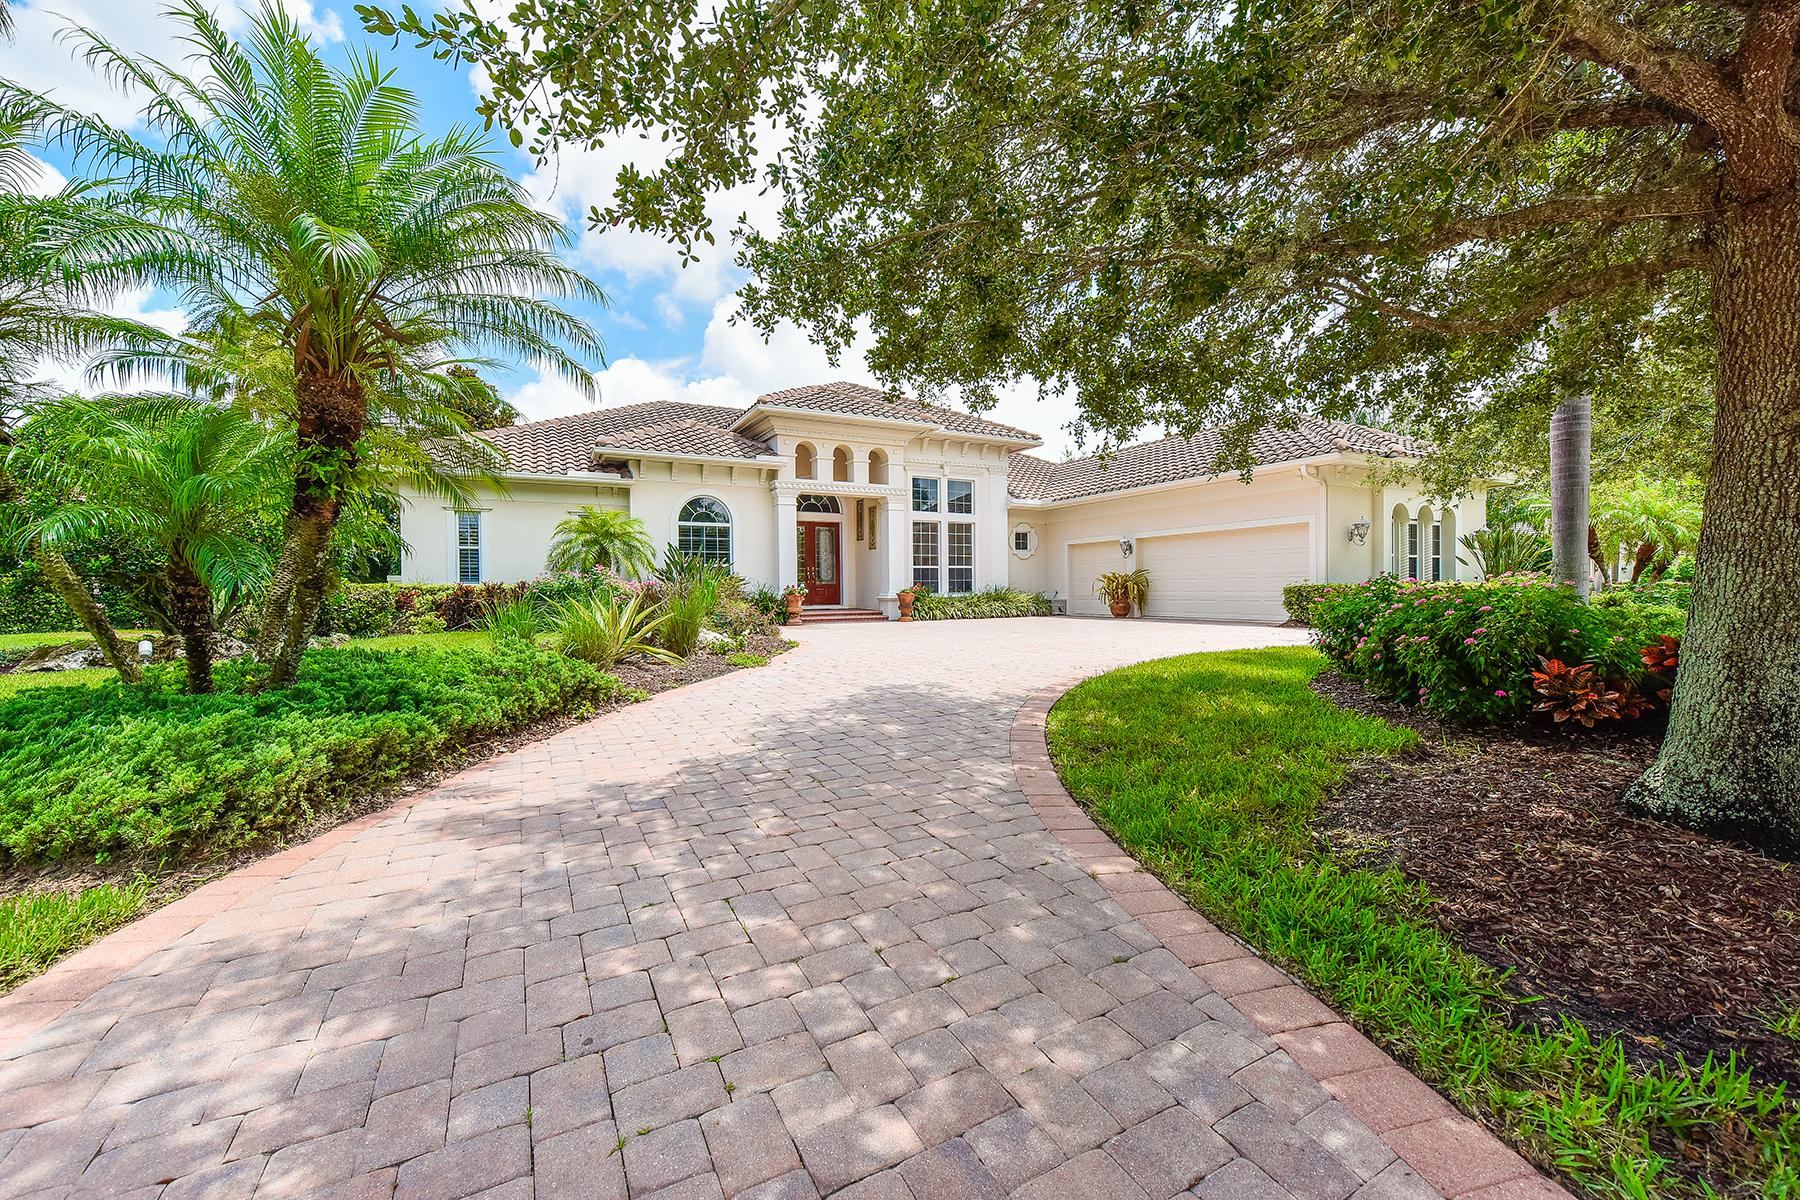 Single Family Home for Sale at SILVER OAK 5219 Sand Lake Ct Sarasota, Florida, 34238 United States